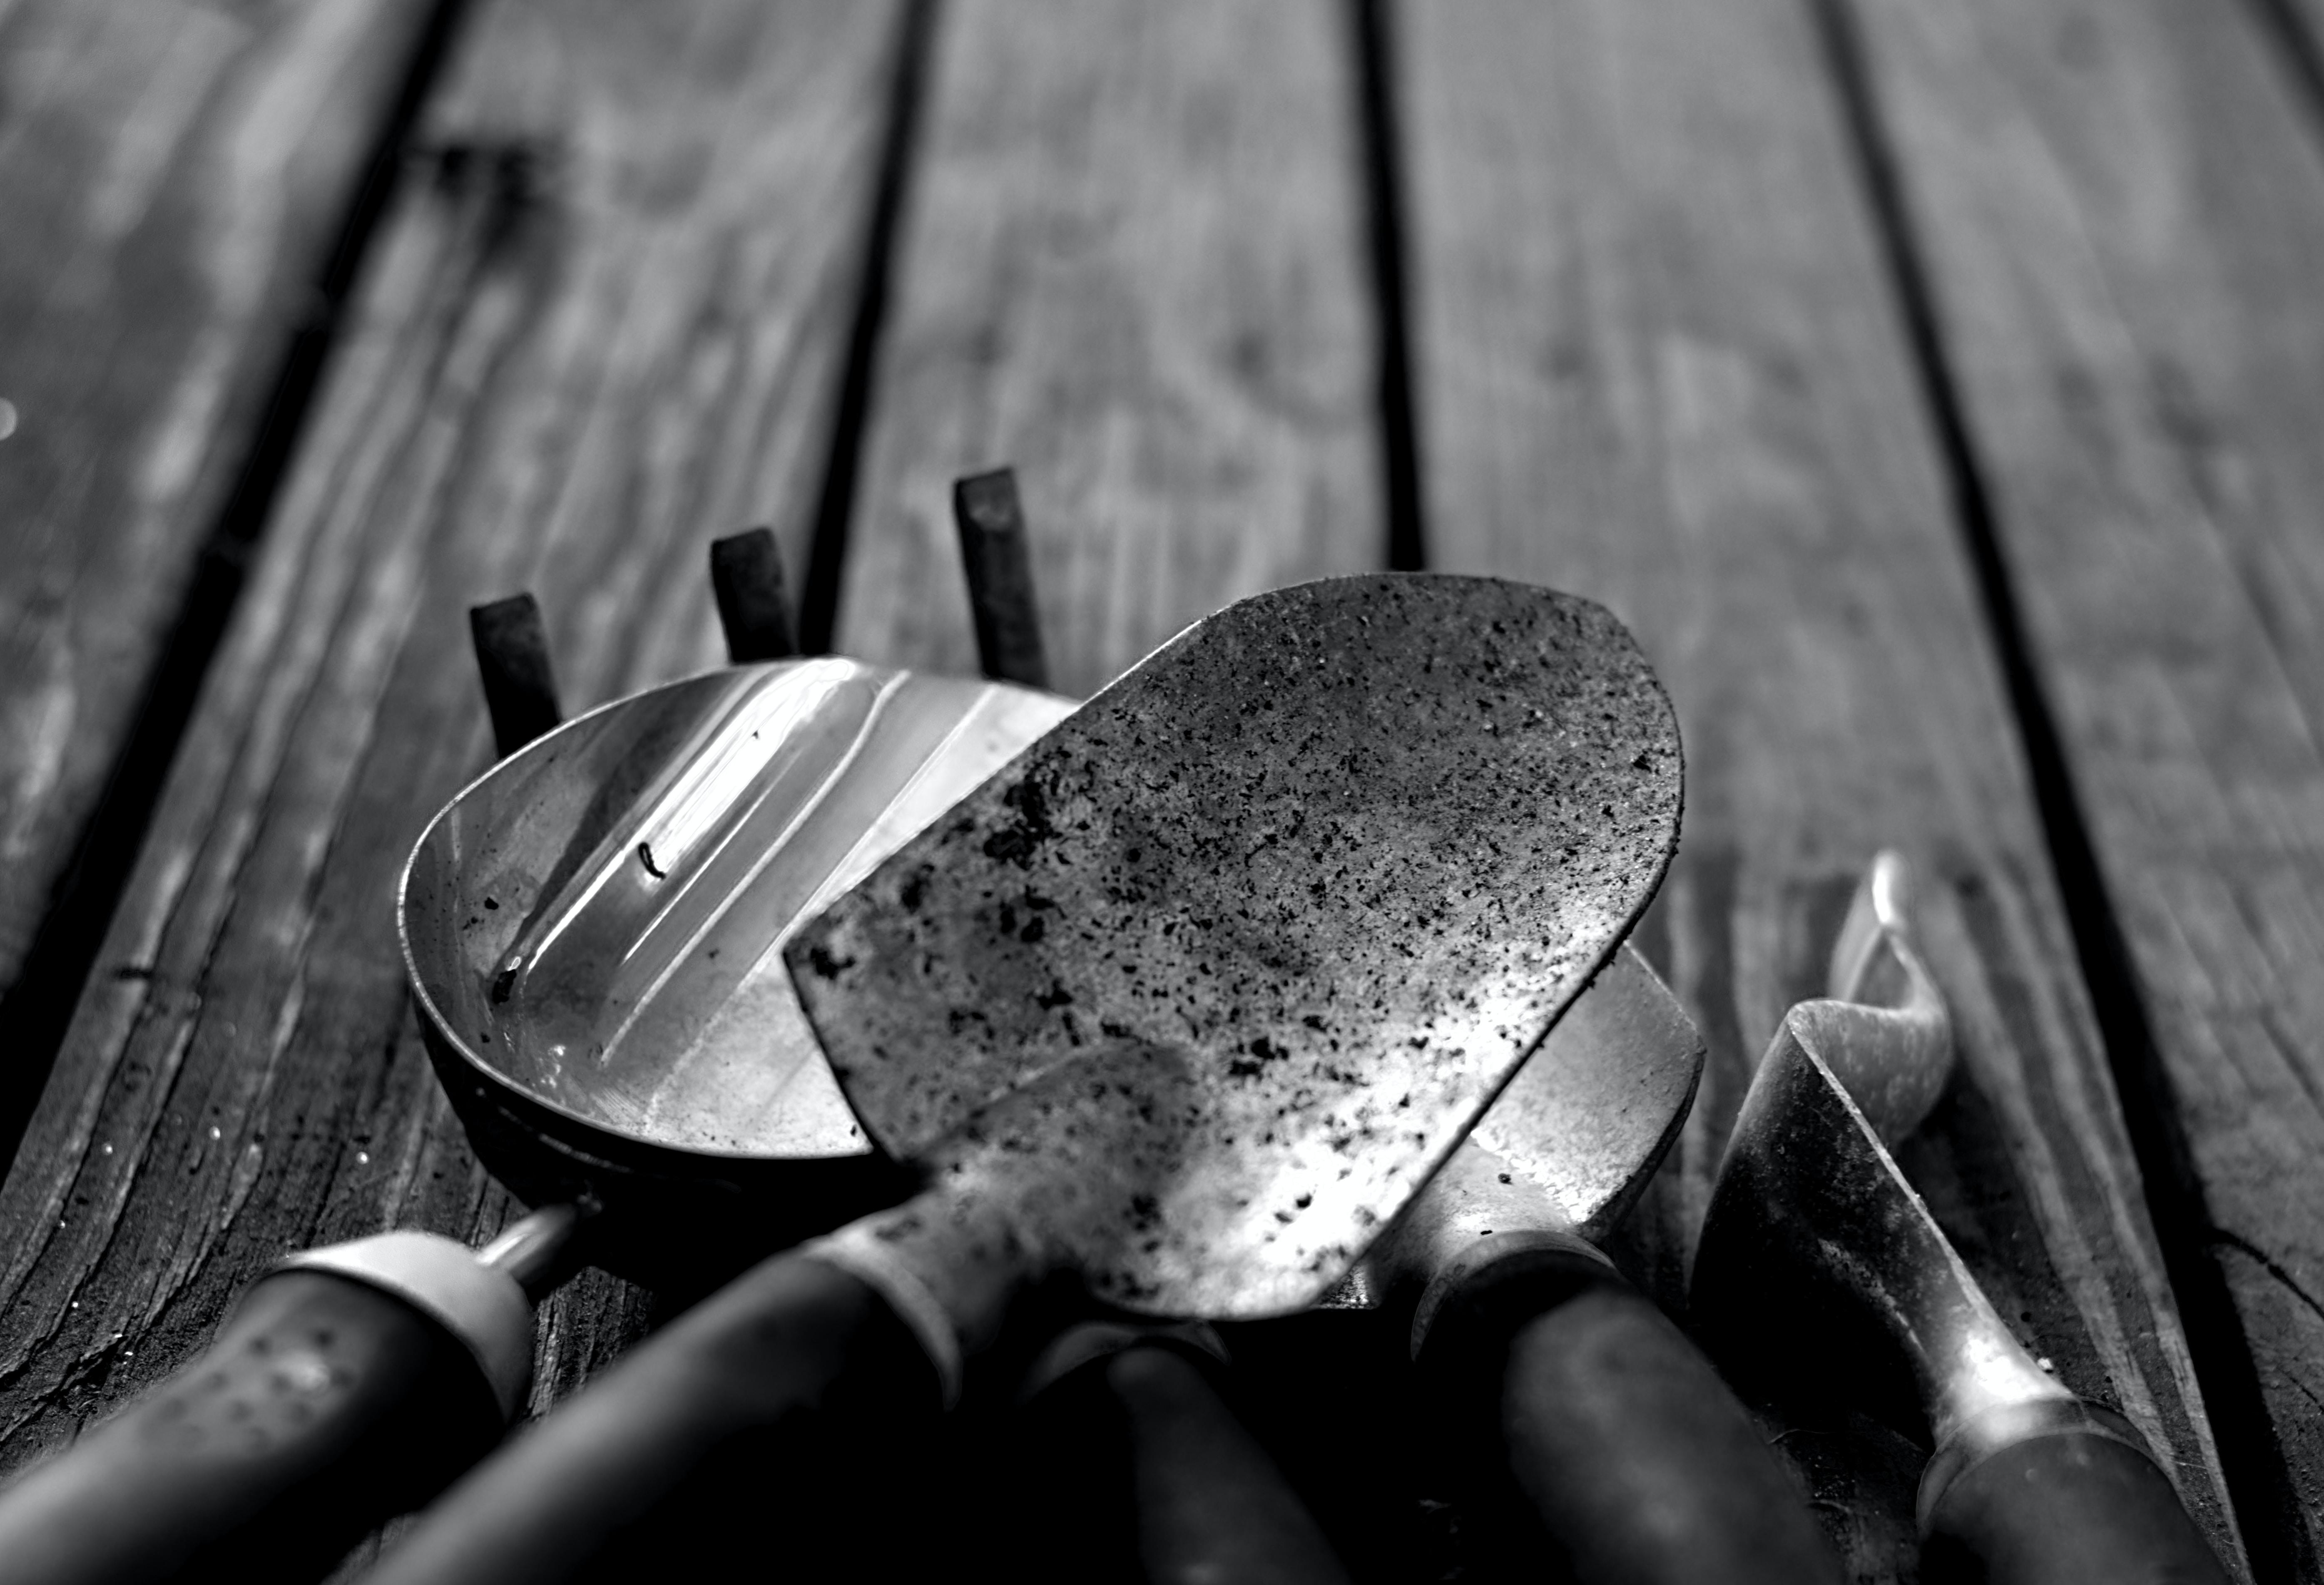 greyscale photo of gardening tools